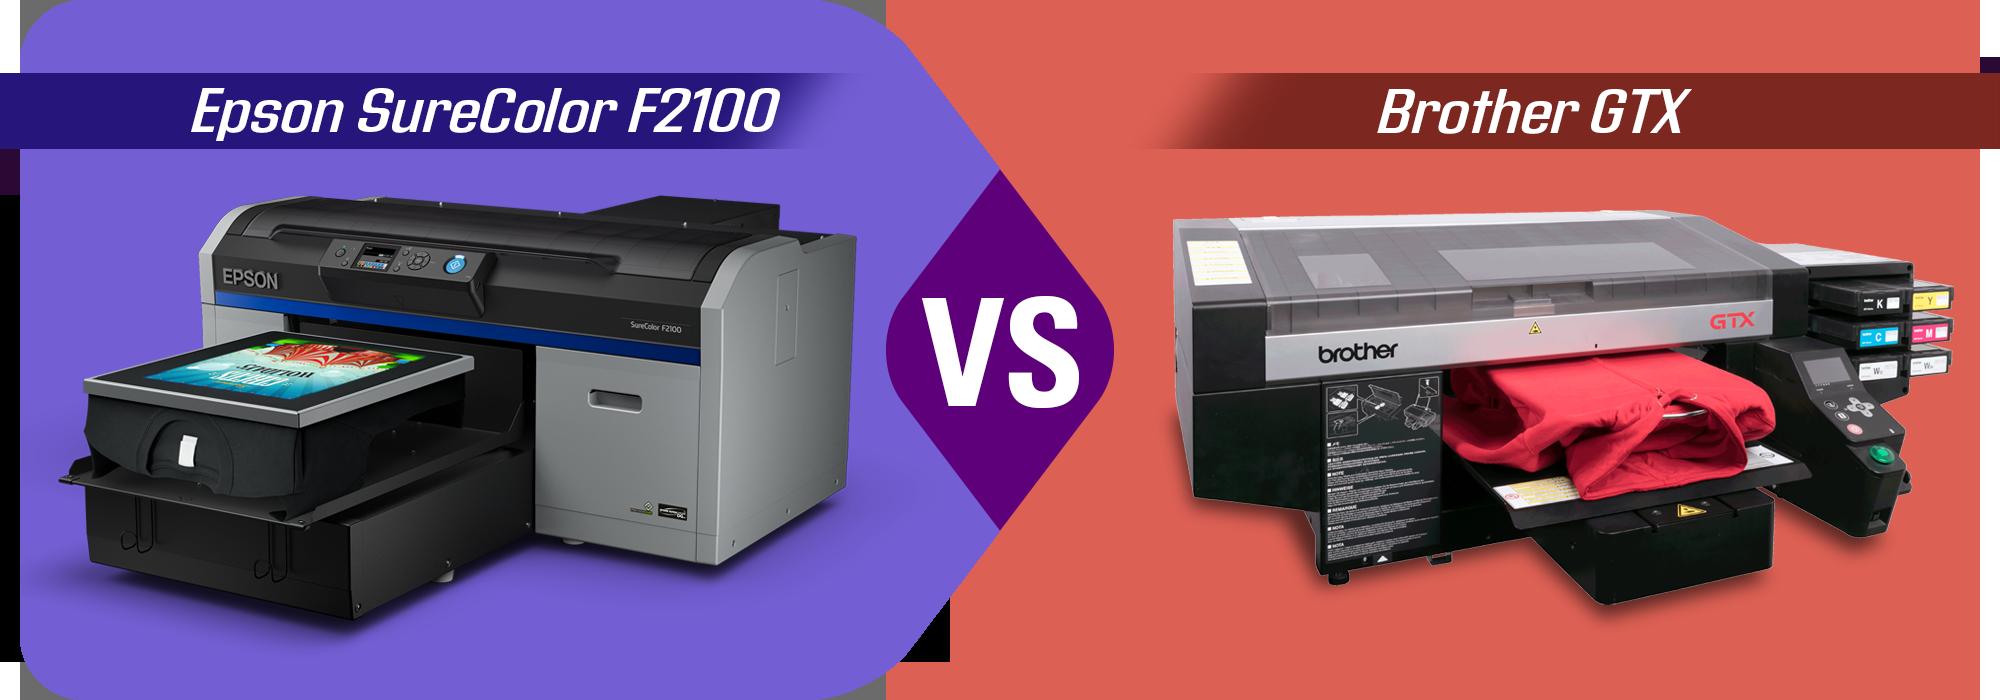 Epson SureColor F2100 vs Brother GTX